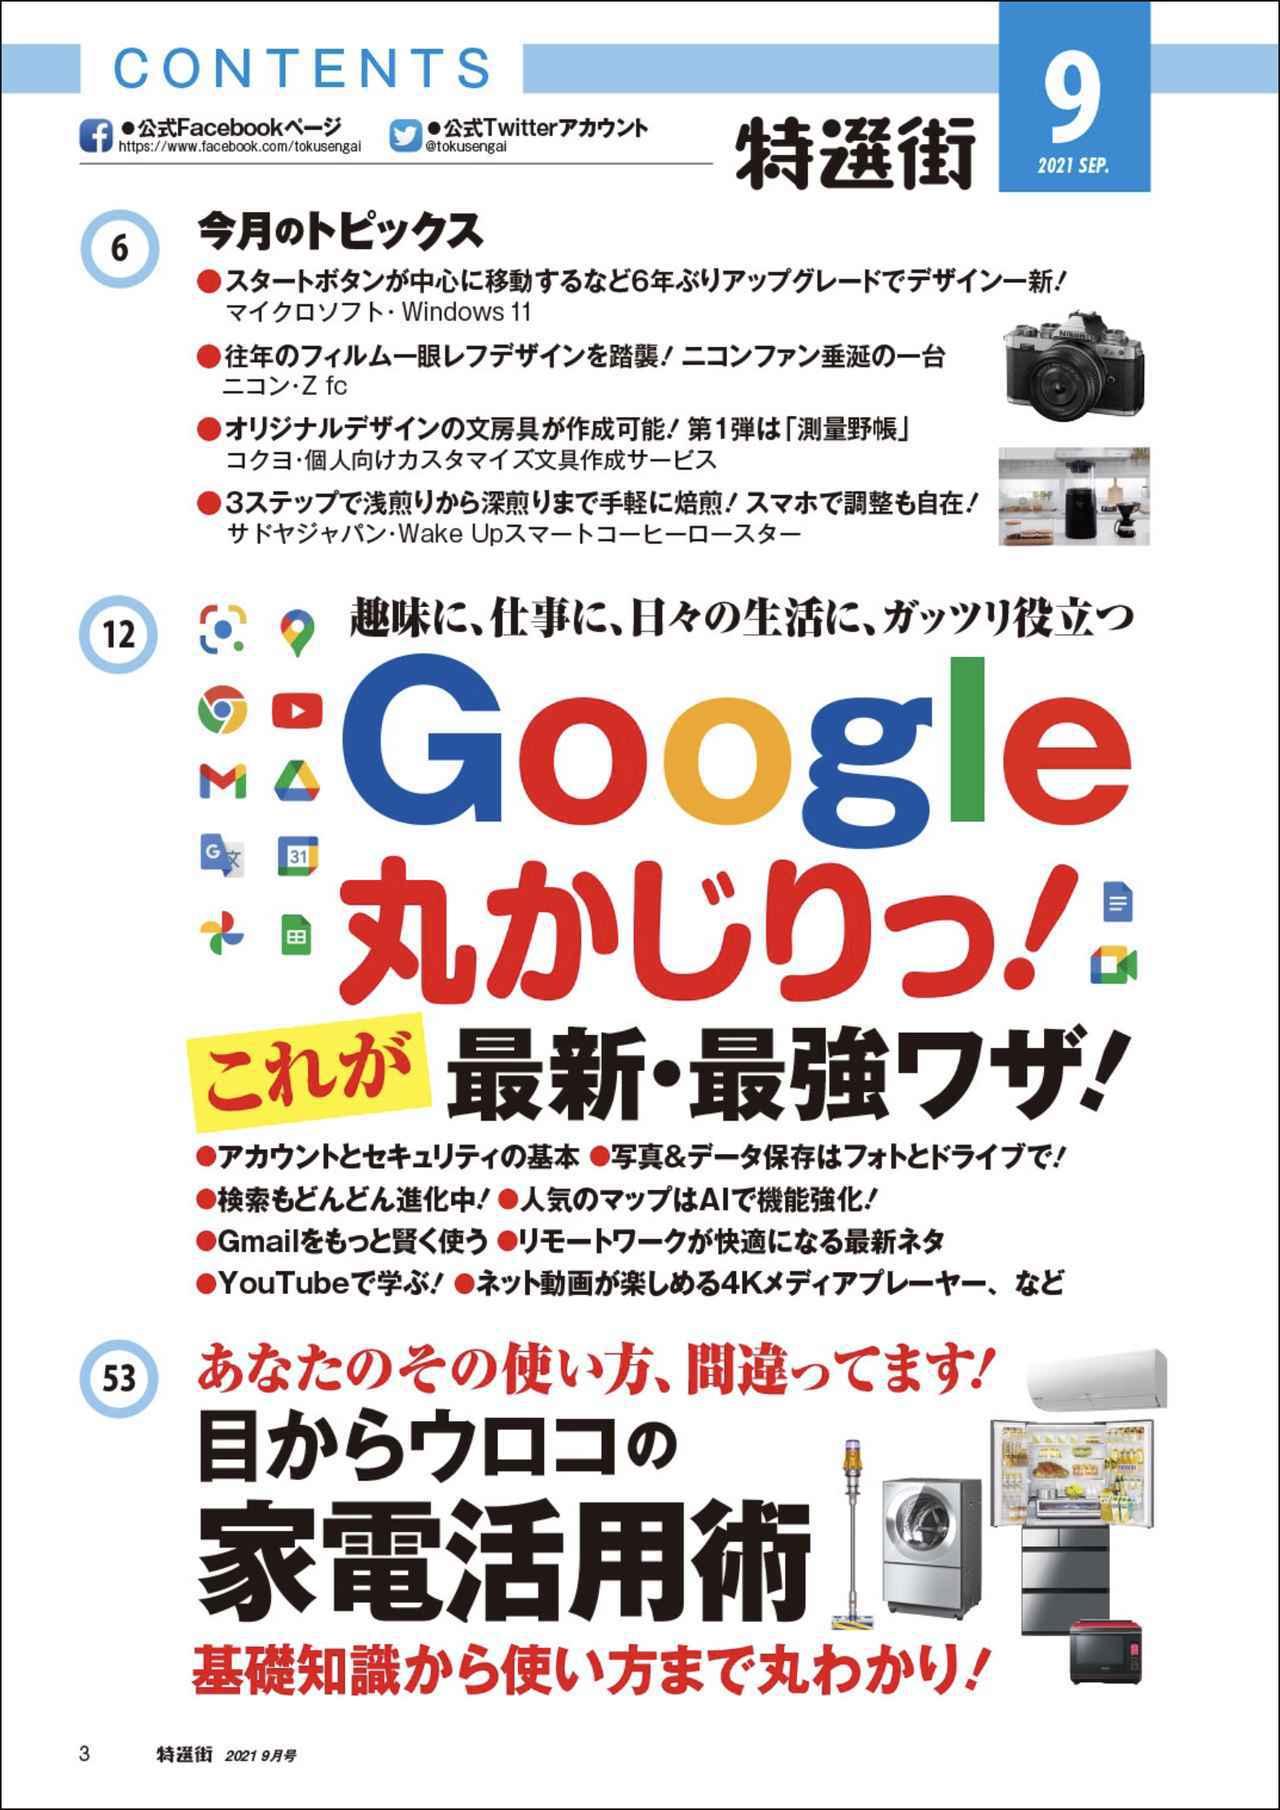 画像1: 【本日発売! 特選街9月号】Googleの最新ワザ大特集号!